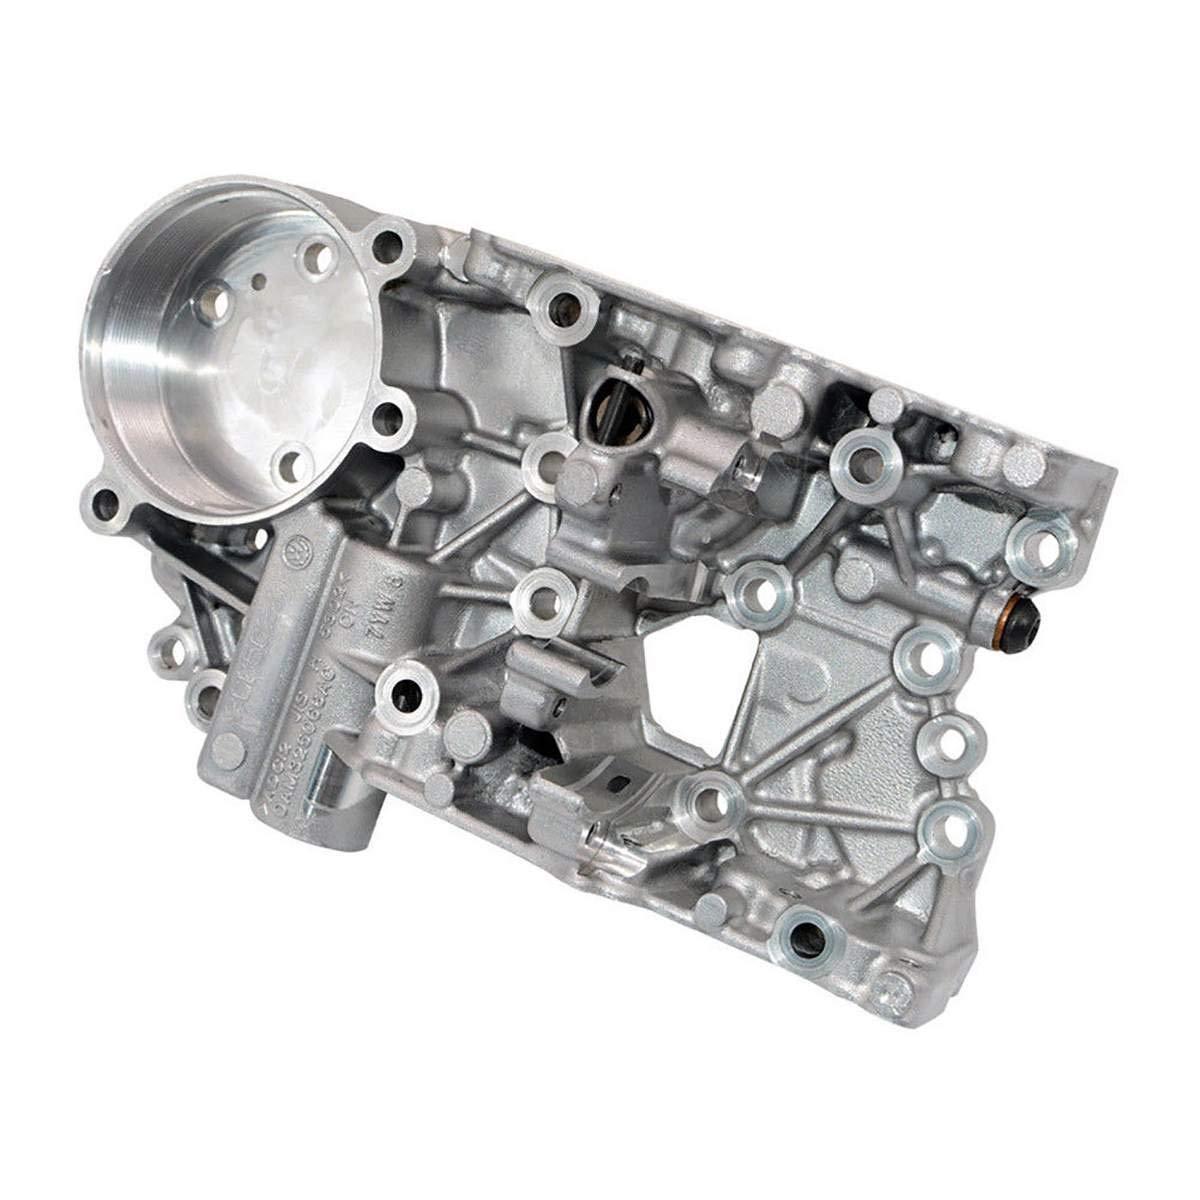 Bestycar DSG OAM DQ200 Transmission Valve Body Accumulator Housing Metal Auto Replacement Parts For Audi/VW Skoda Seat 0AM325066AC 0AM325066C 0AM325066R